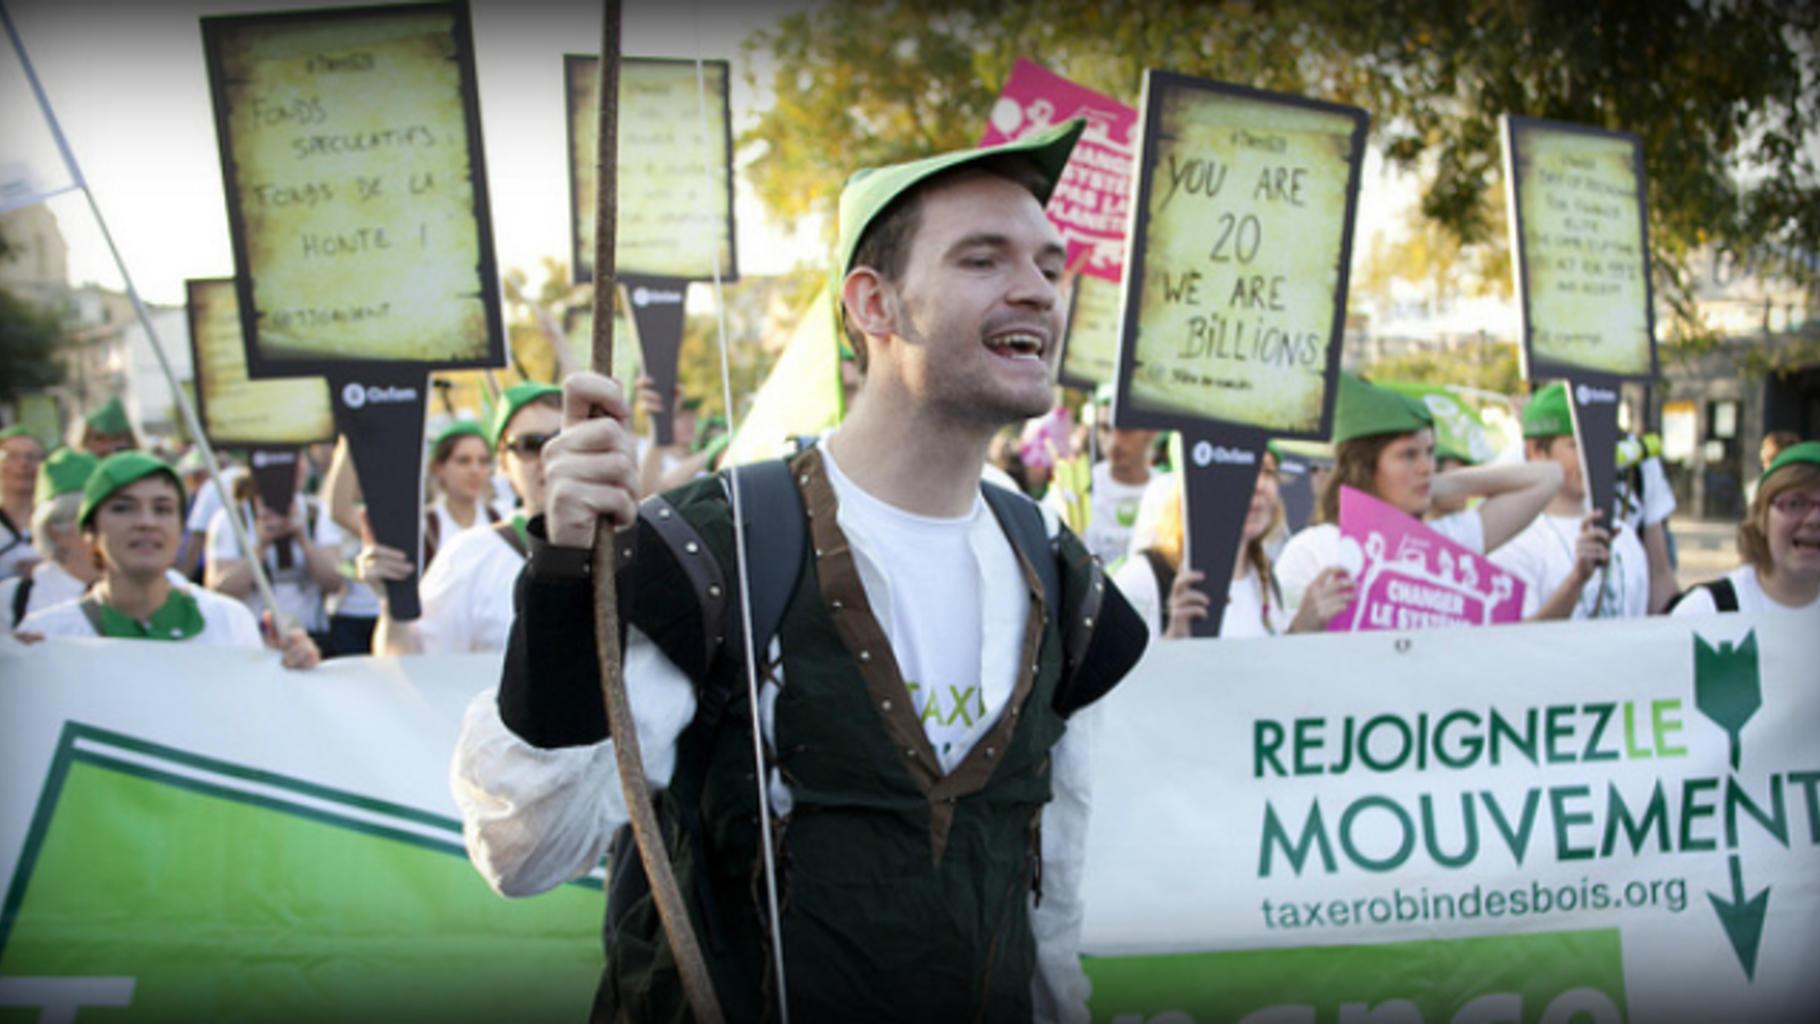 Robin Hood im Demozug vor Banner